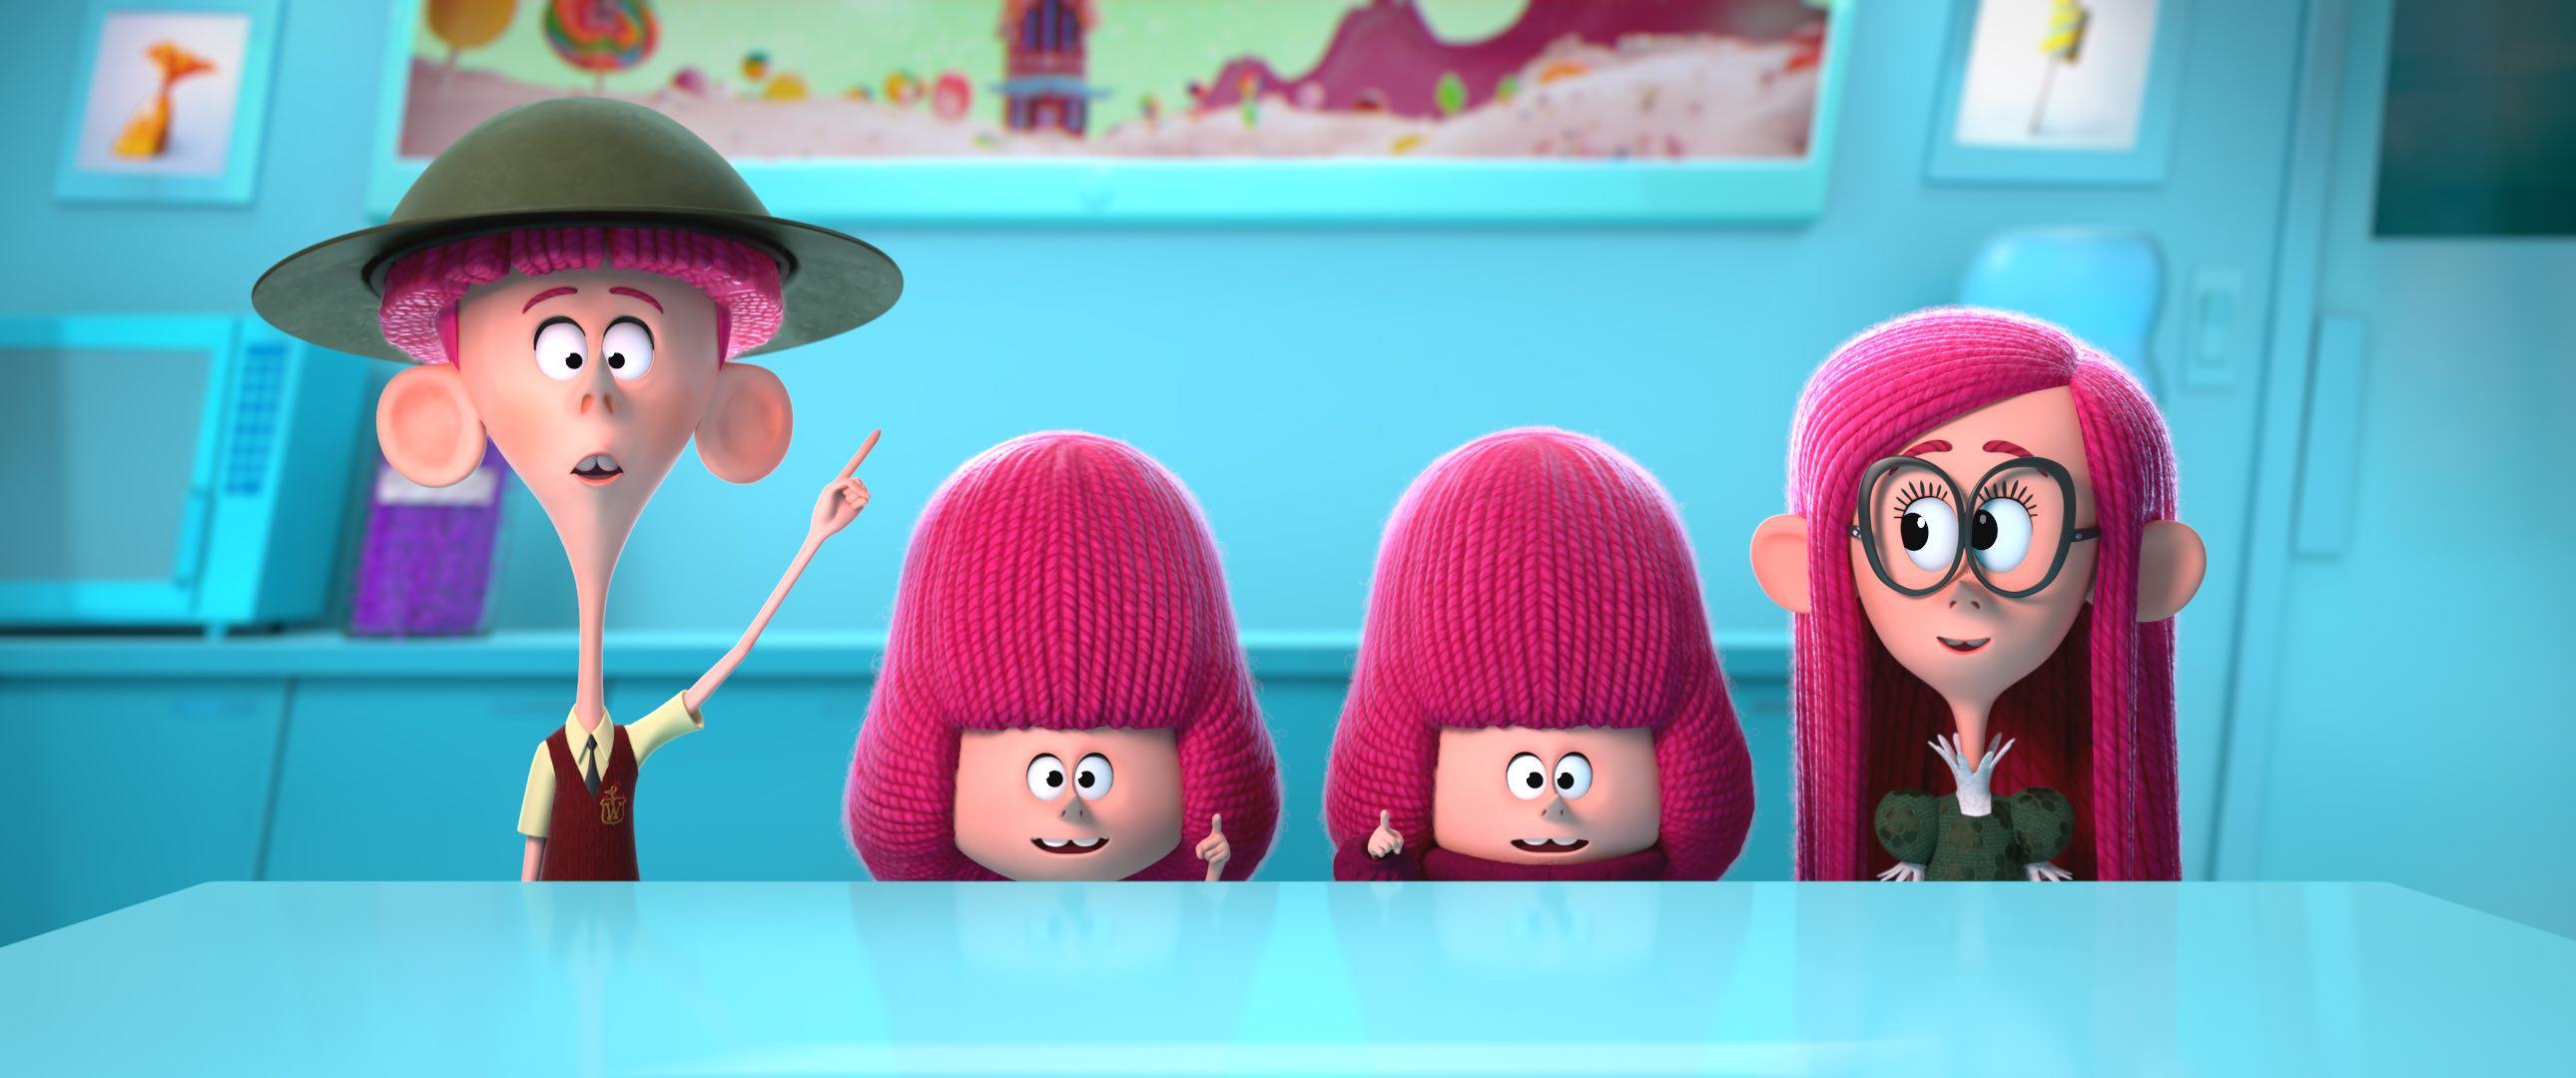 Top 10 Children's Movies on Netflix Ready to Stream